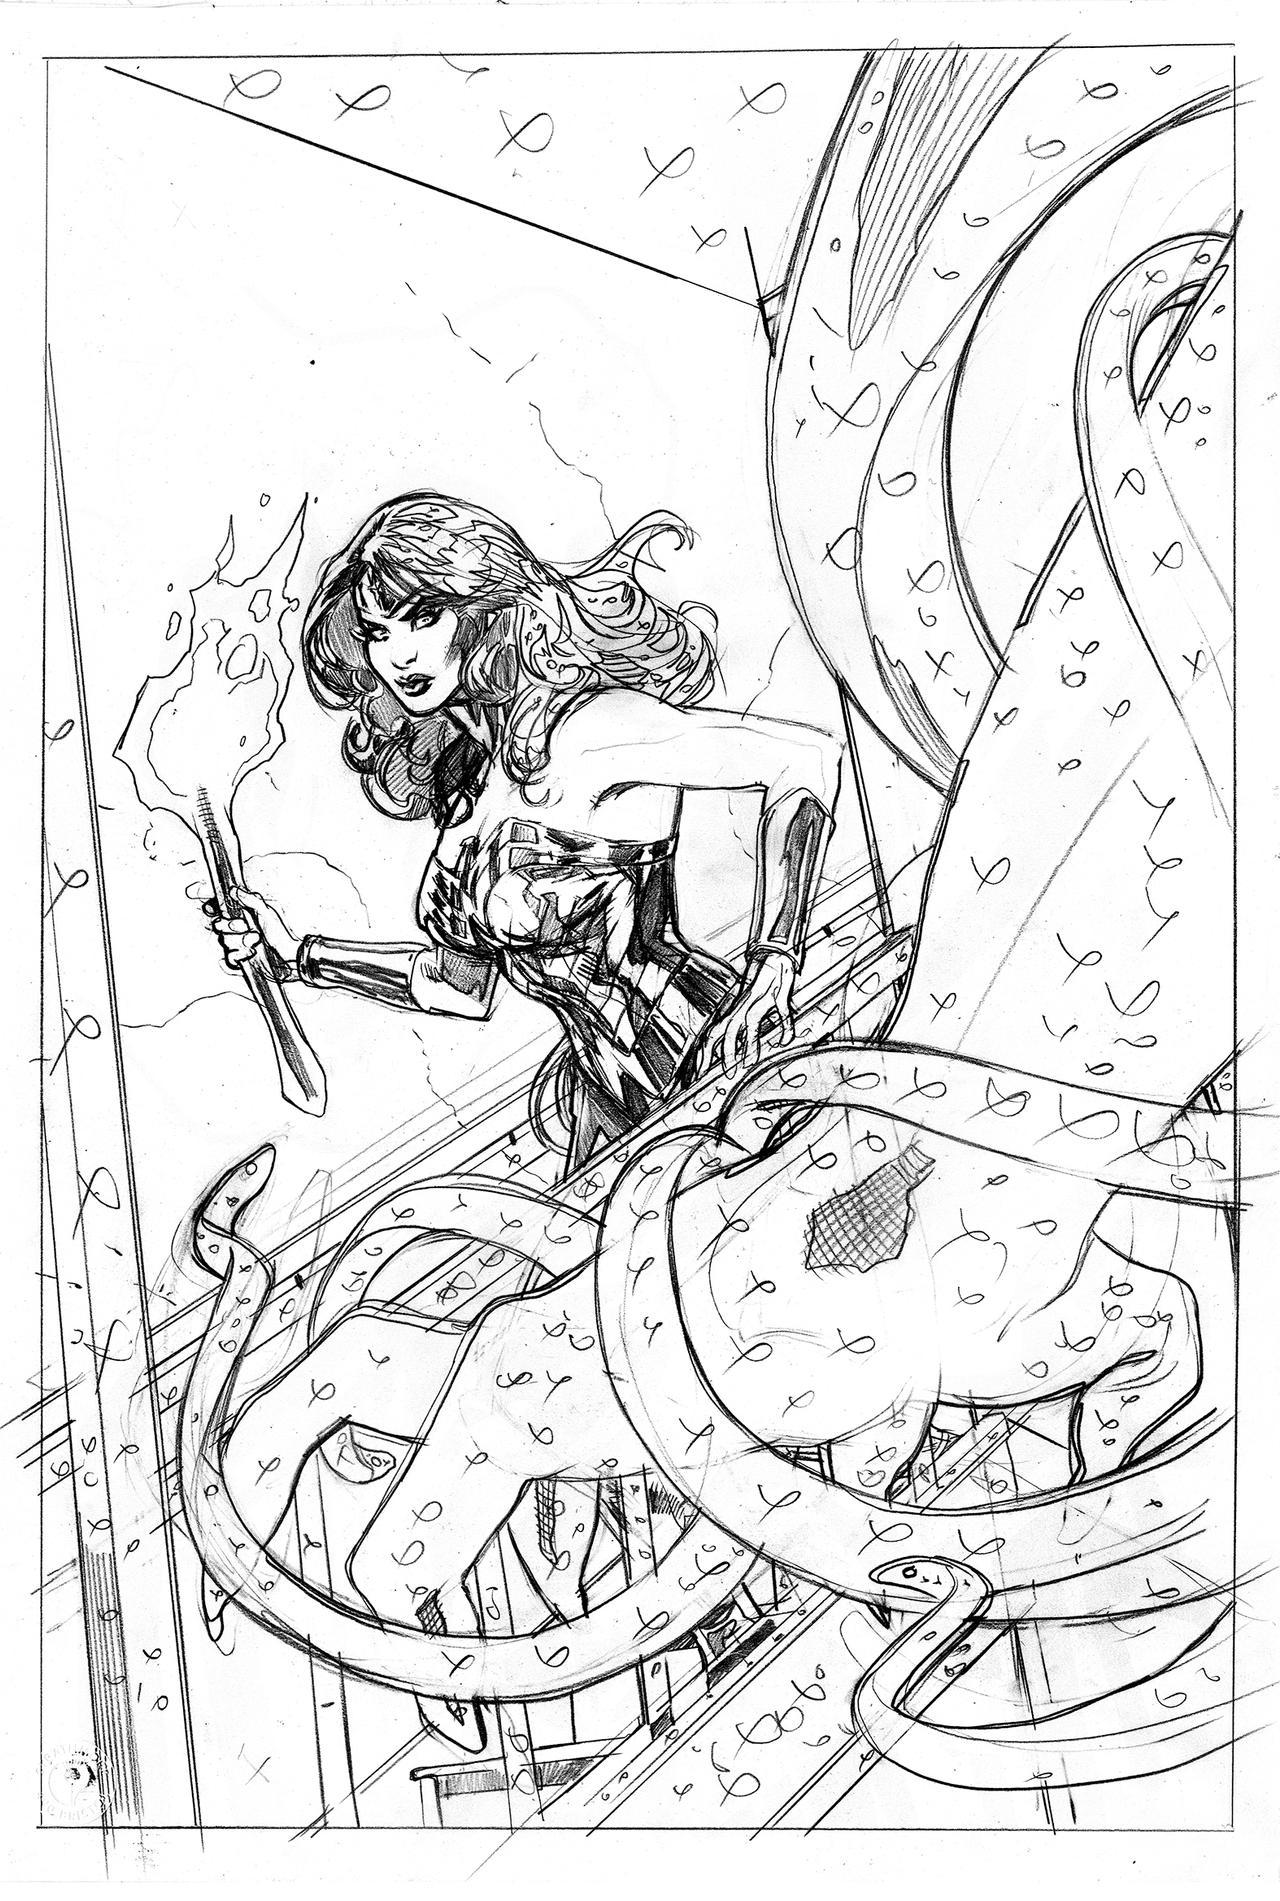 Wonder Woman 64 Cover Pencils